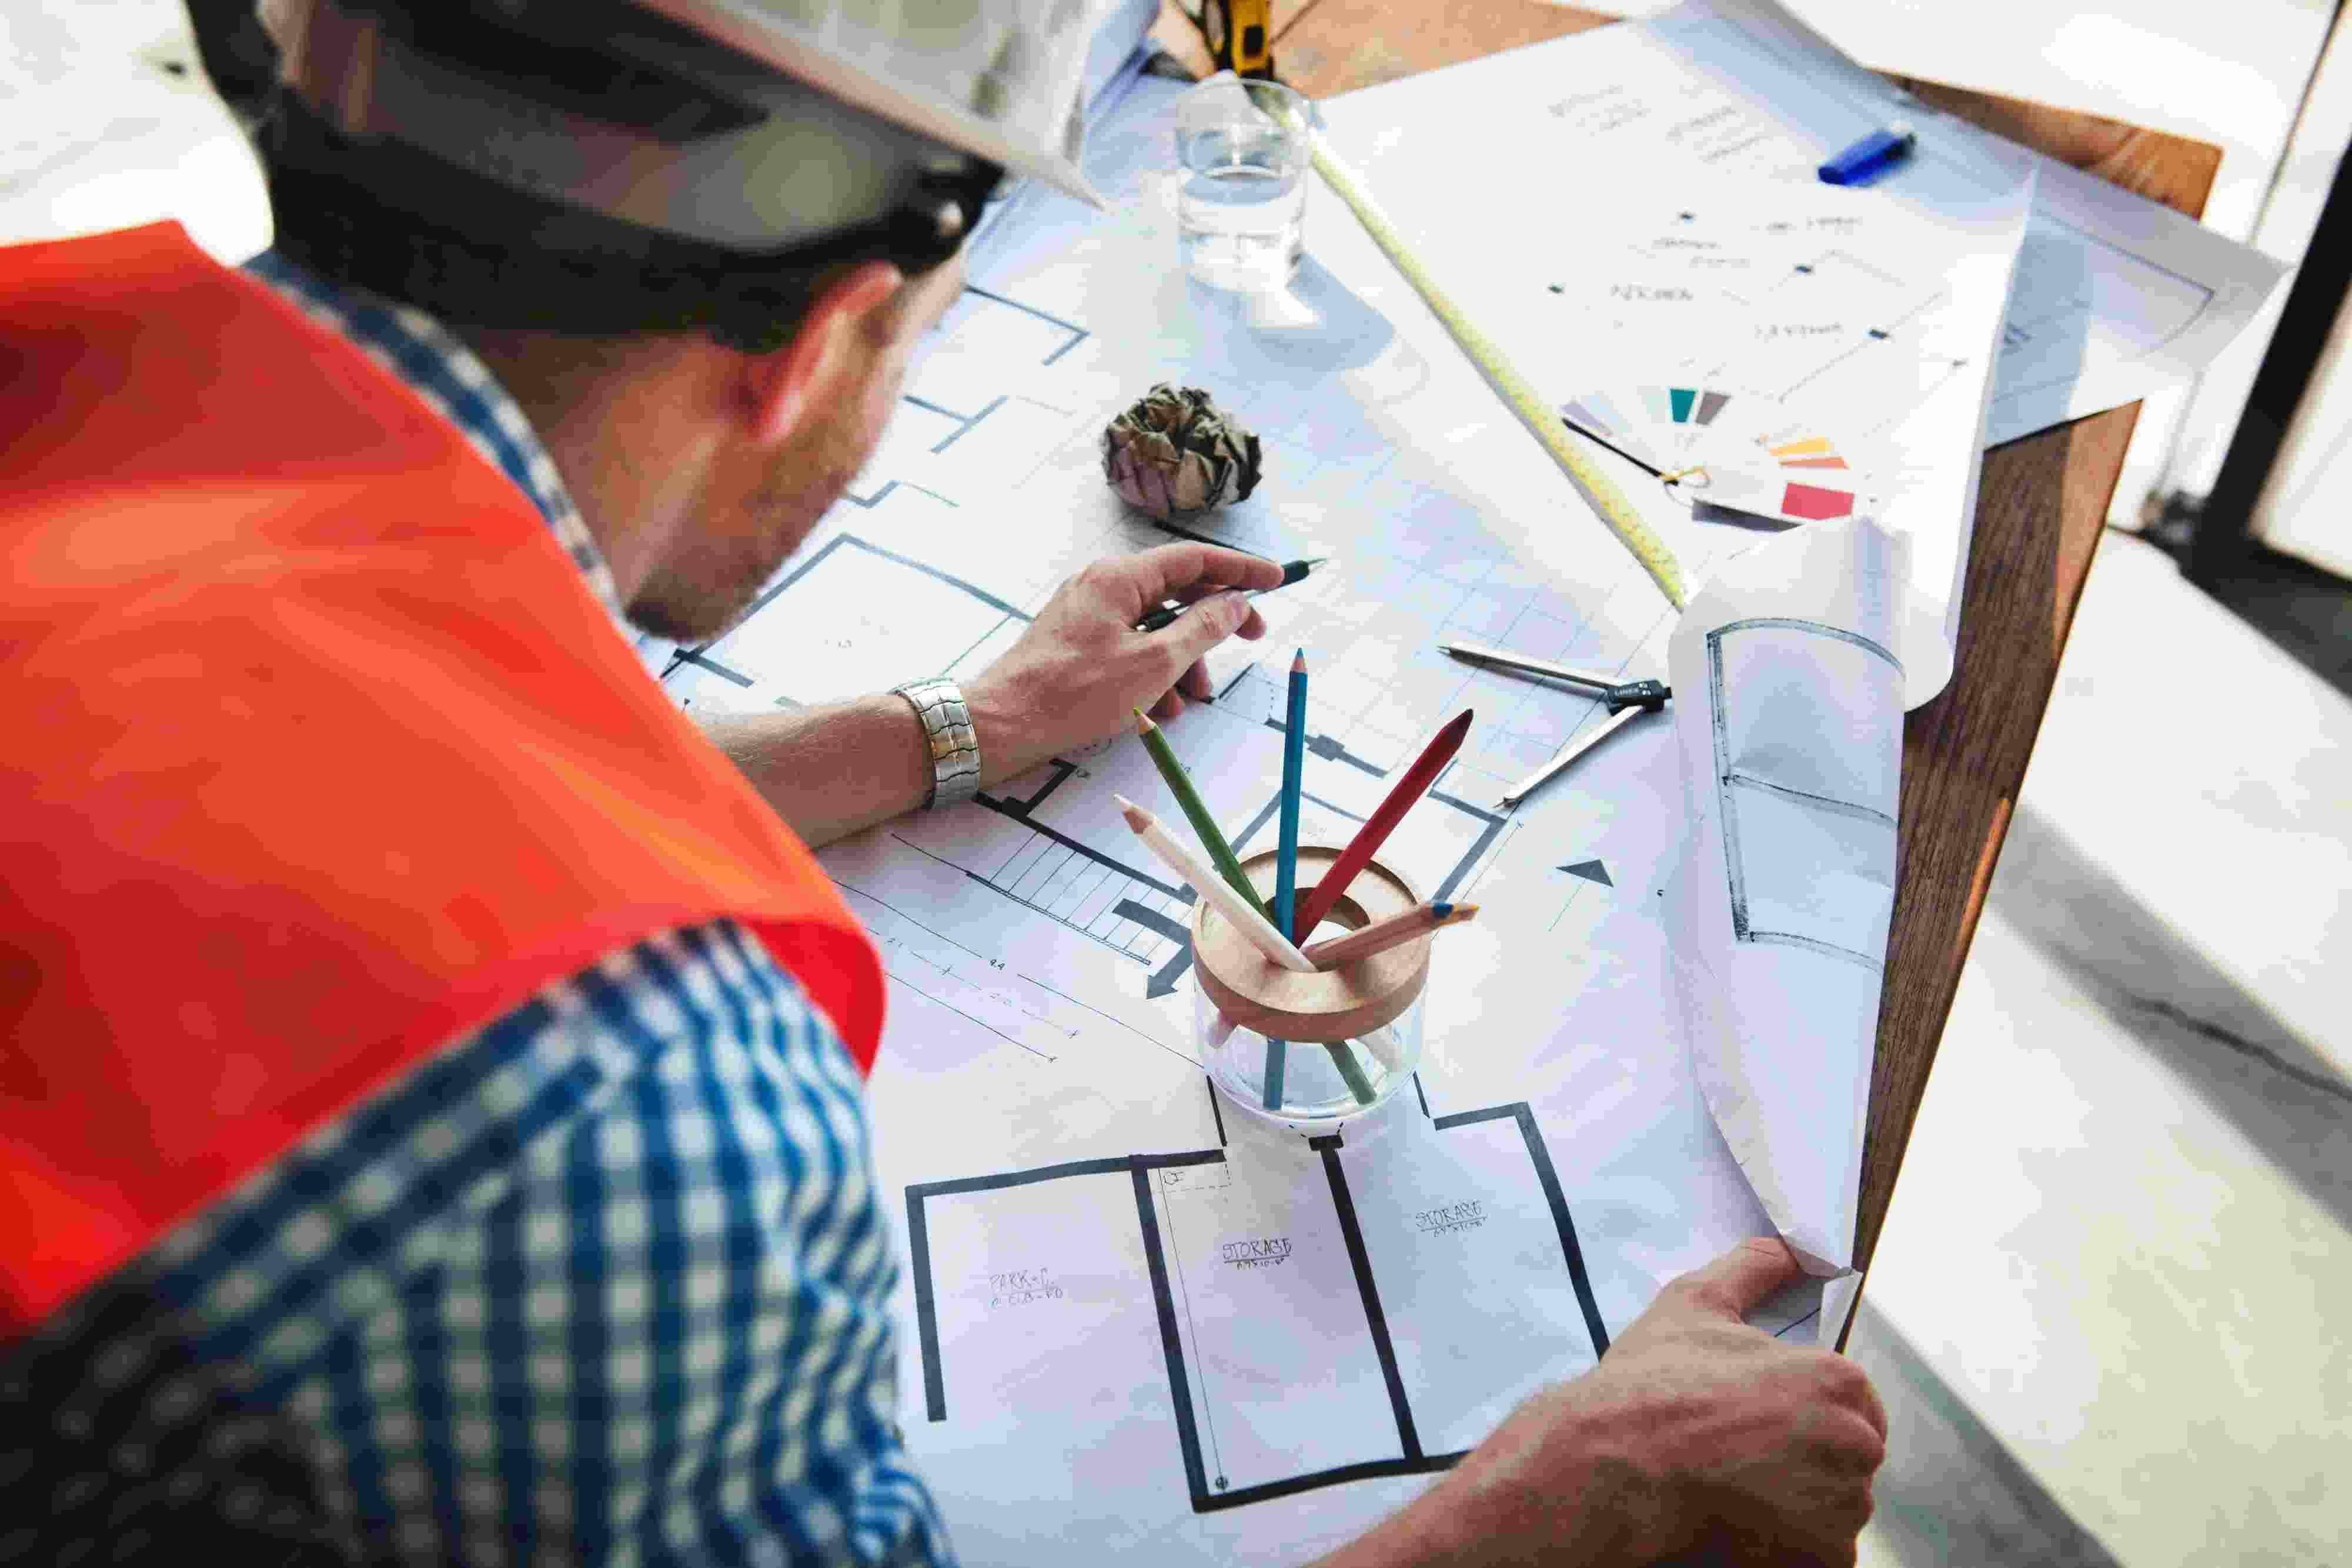 Architectural Development